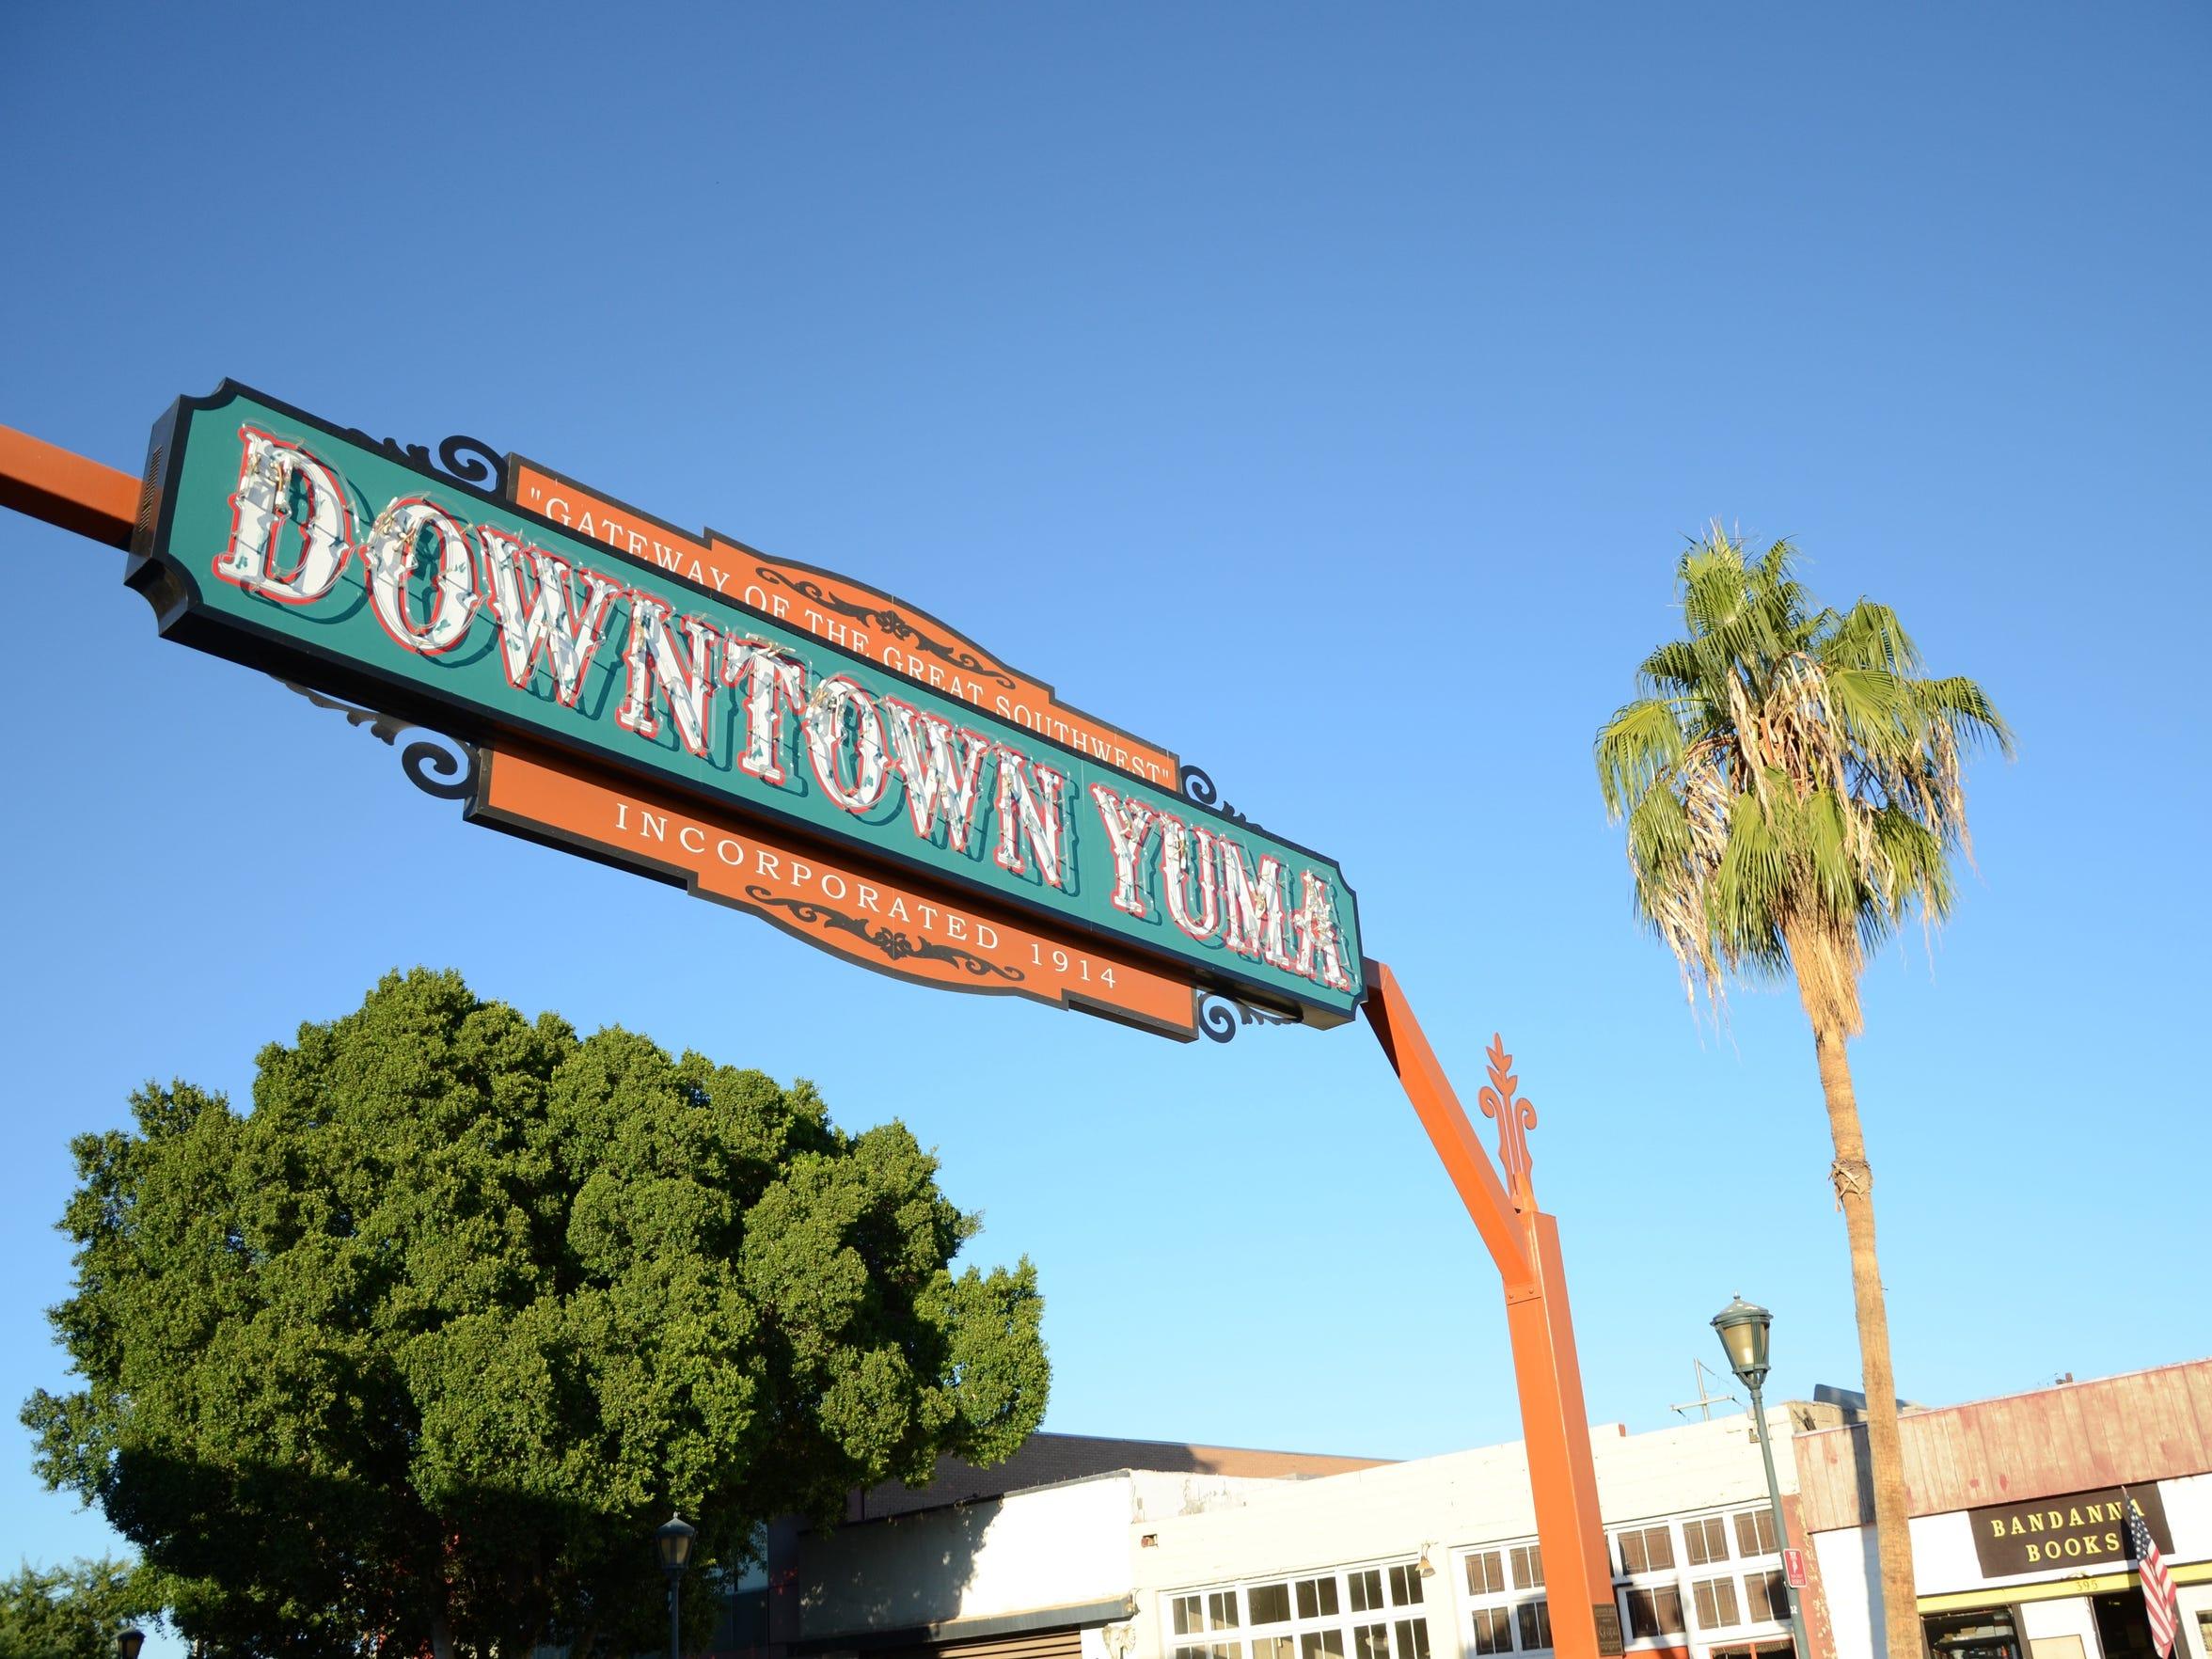 Downtown Yuma, Ariz.